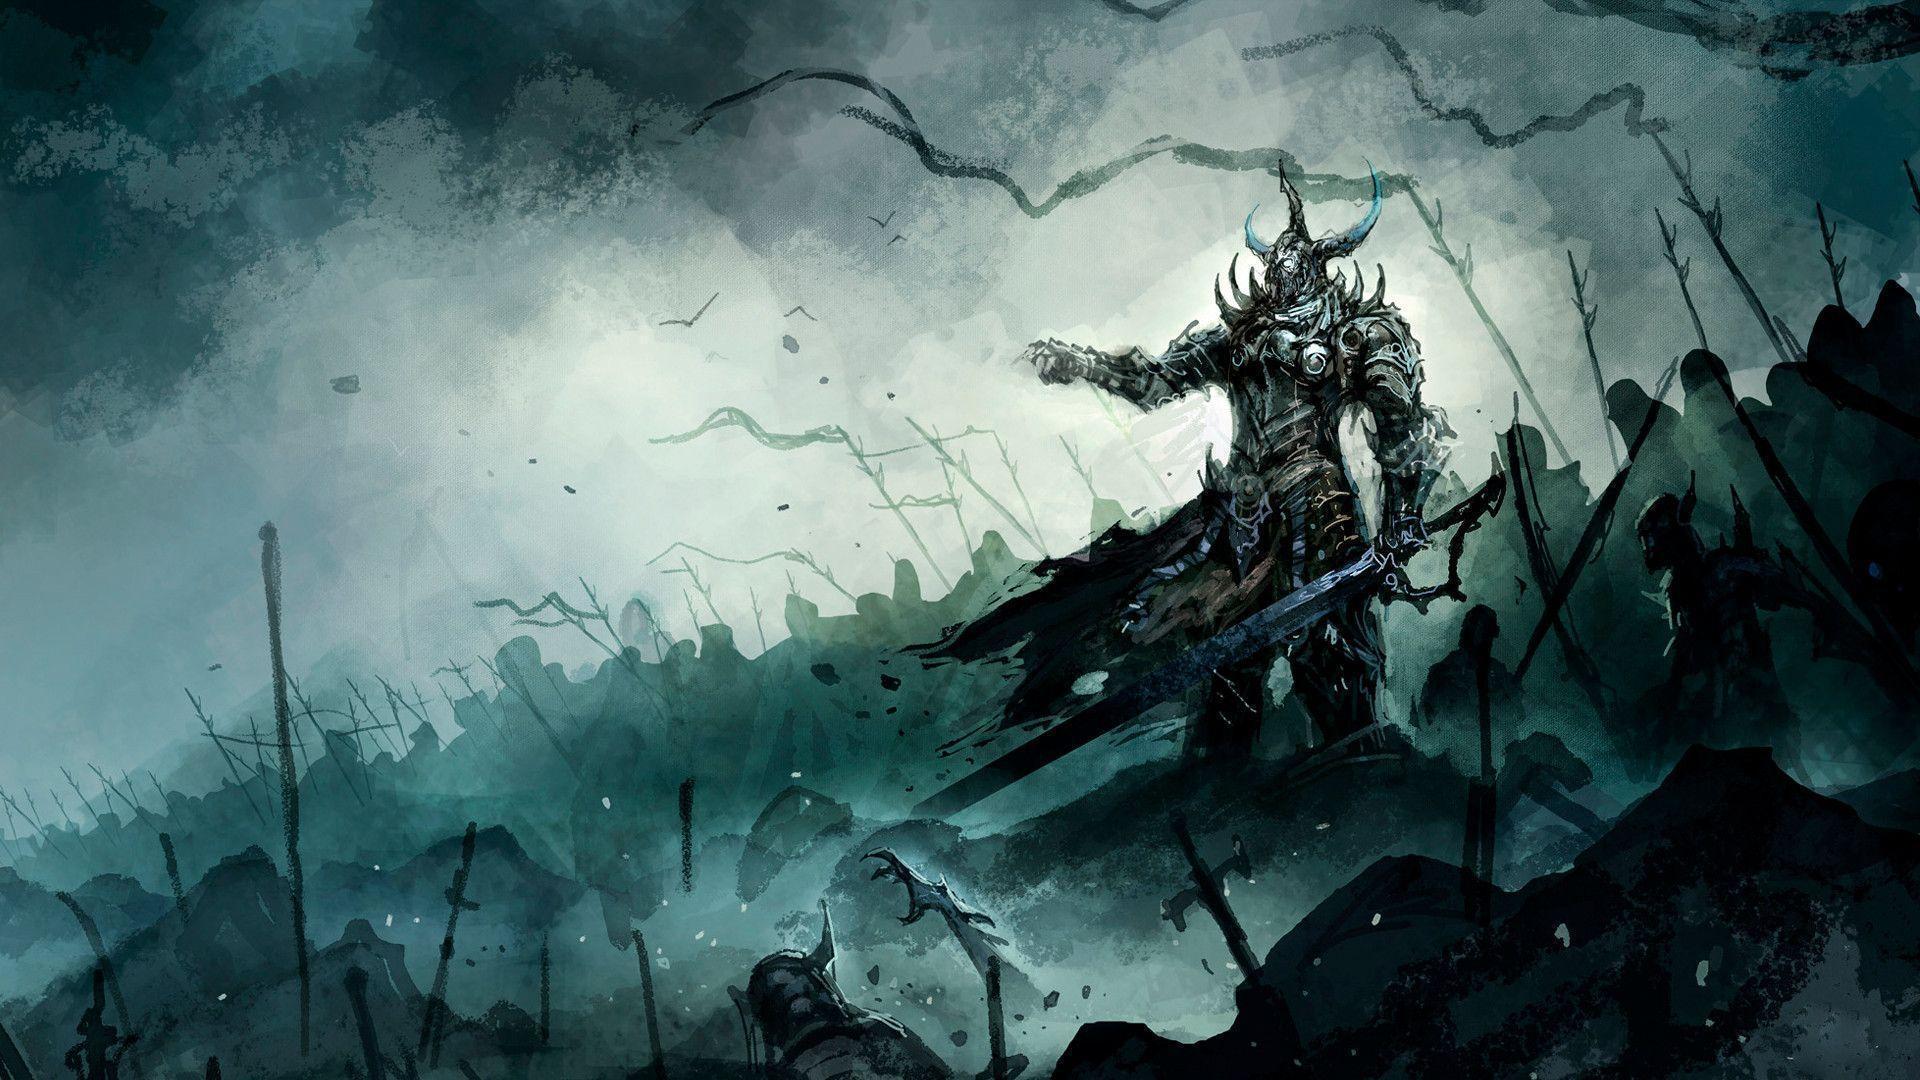 Fantasy Knight Wallpapers - Wallpaper Cave